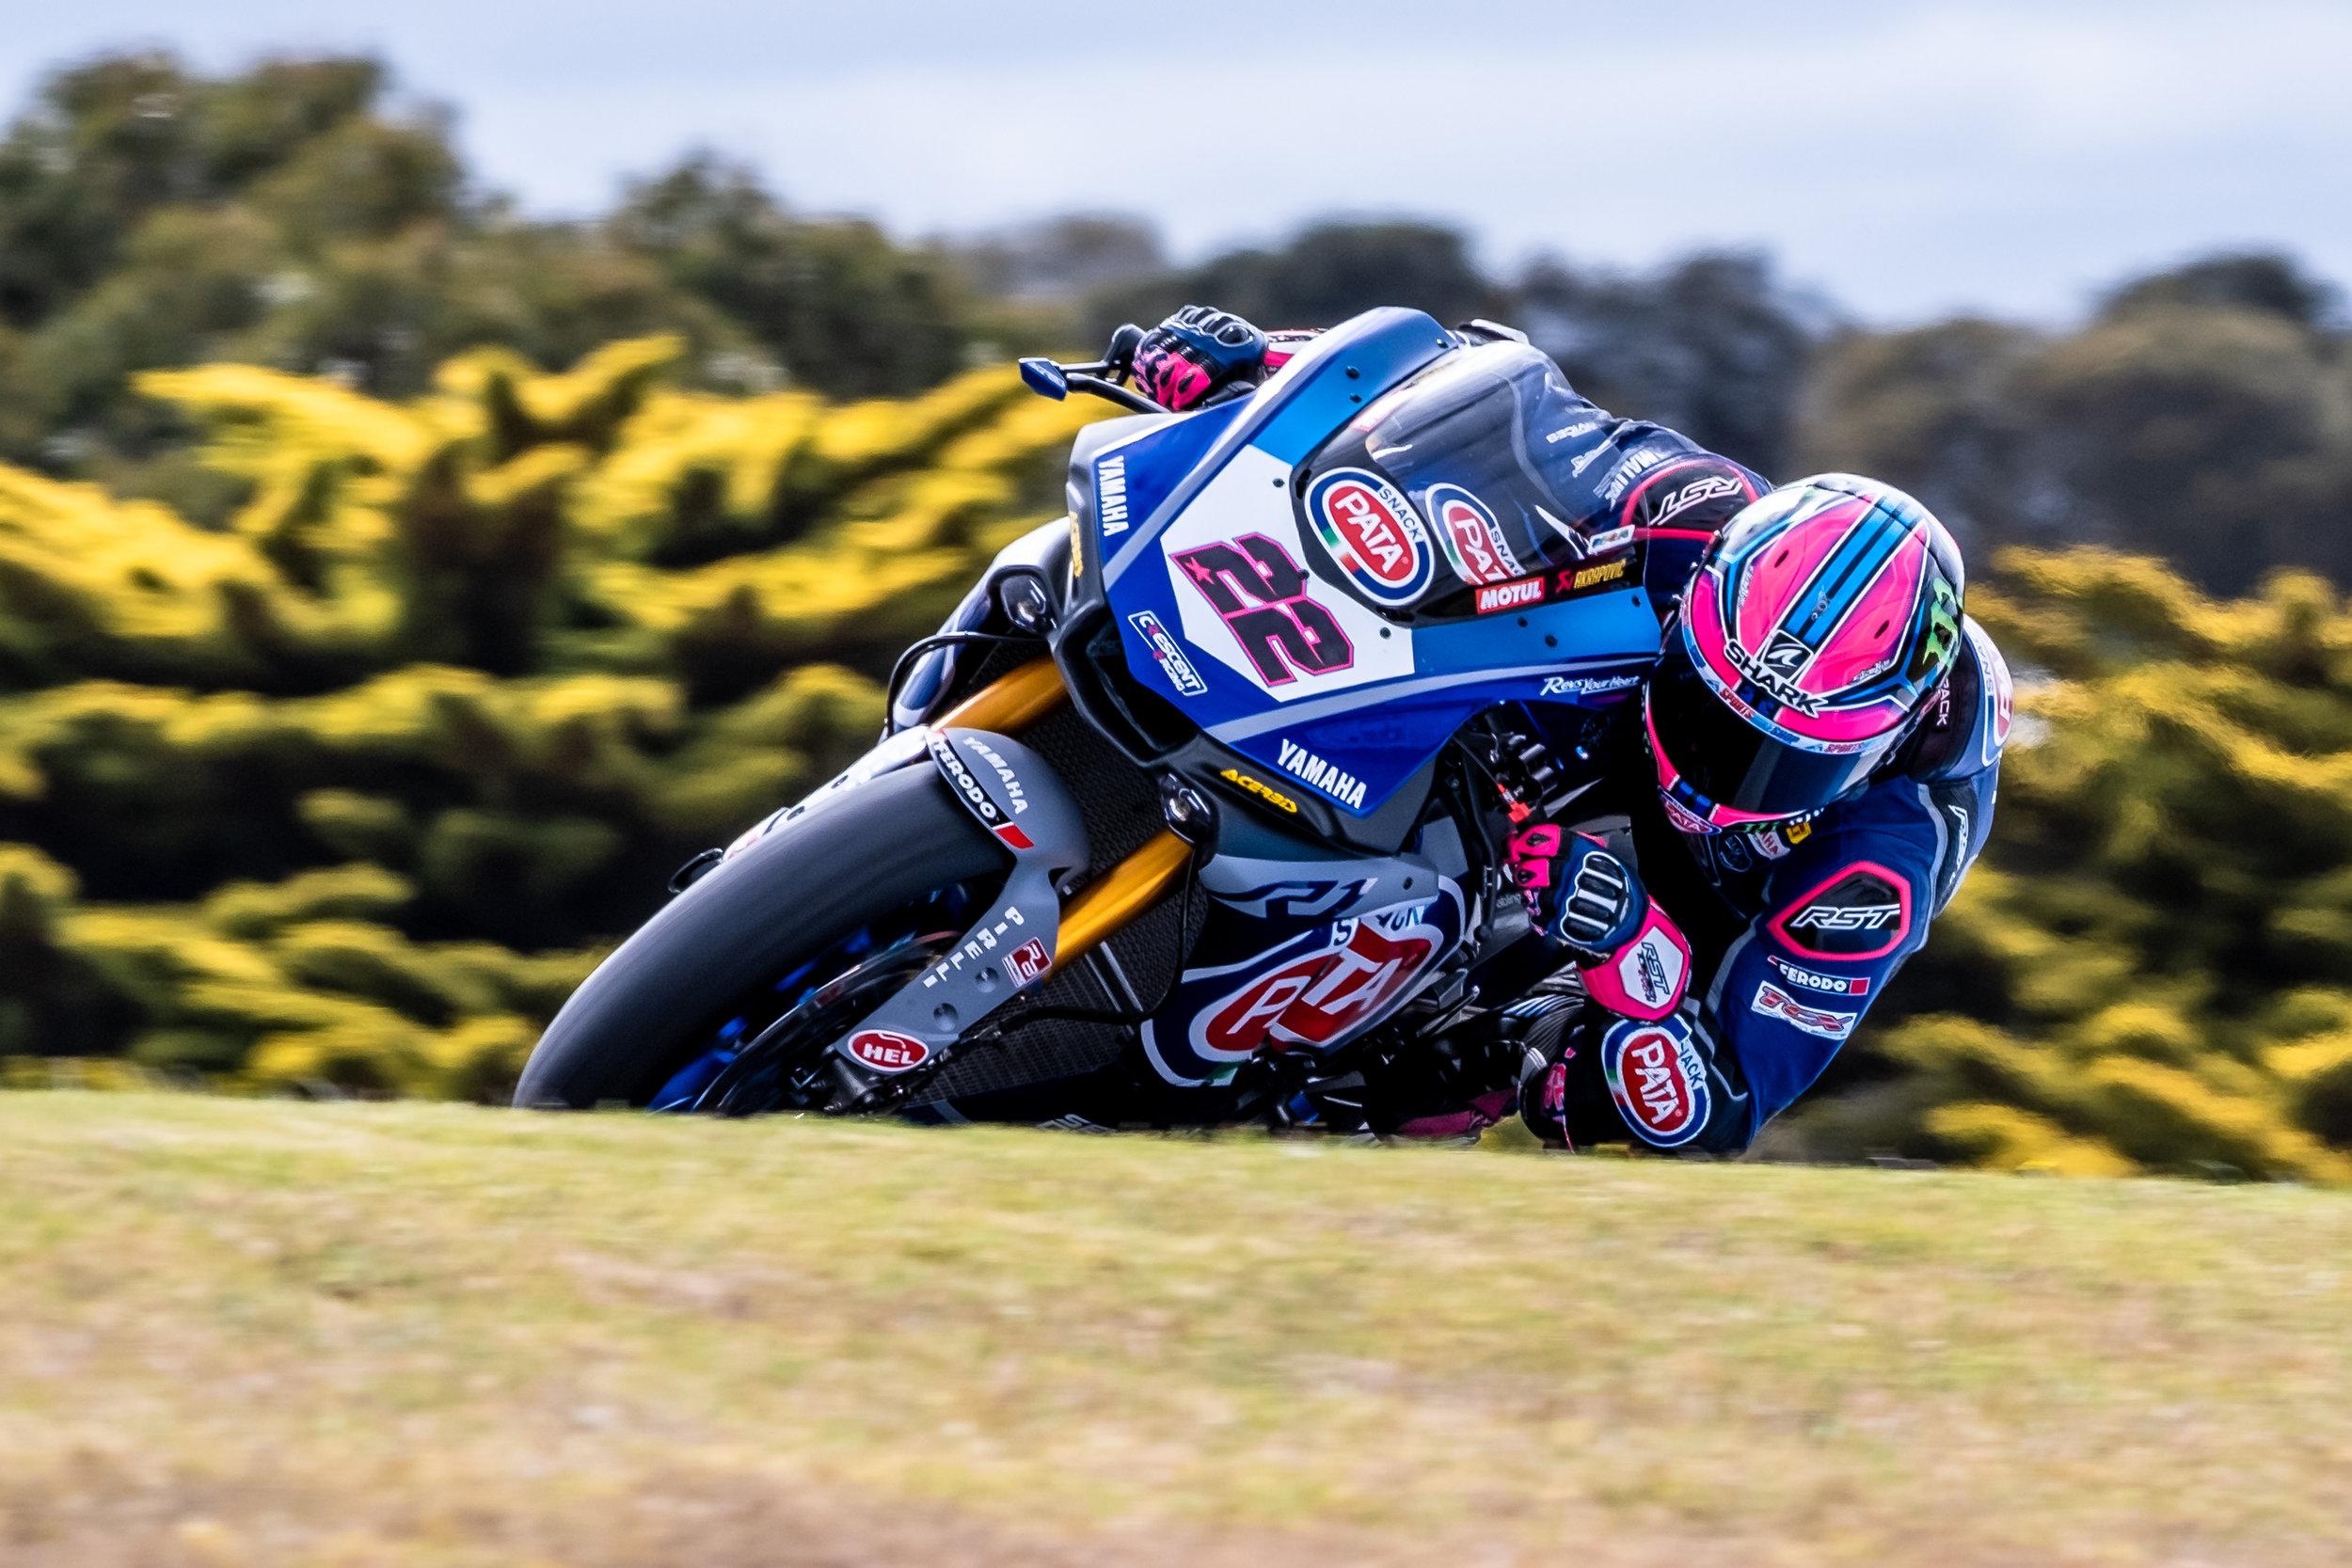 World Superbikes 2019, Phillip Island, Australia